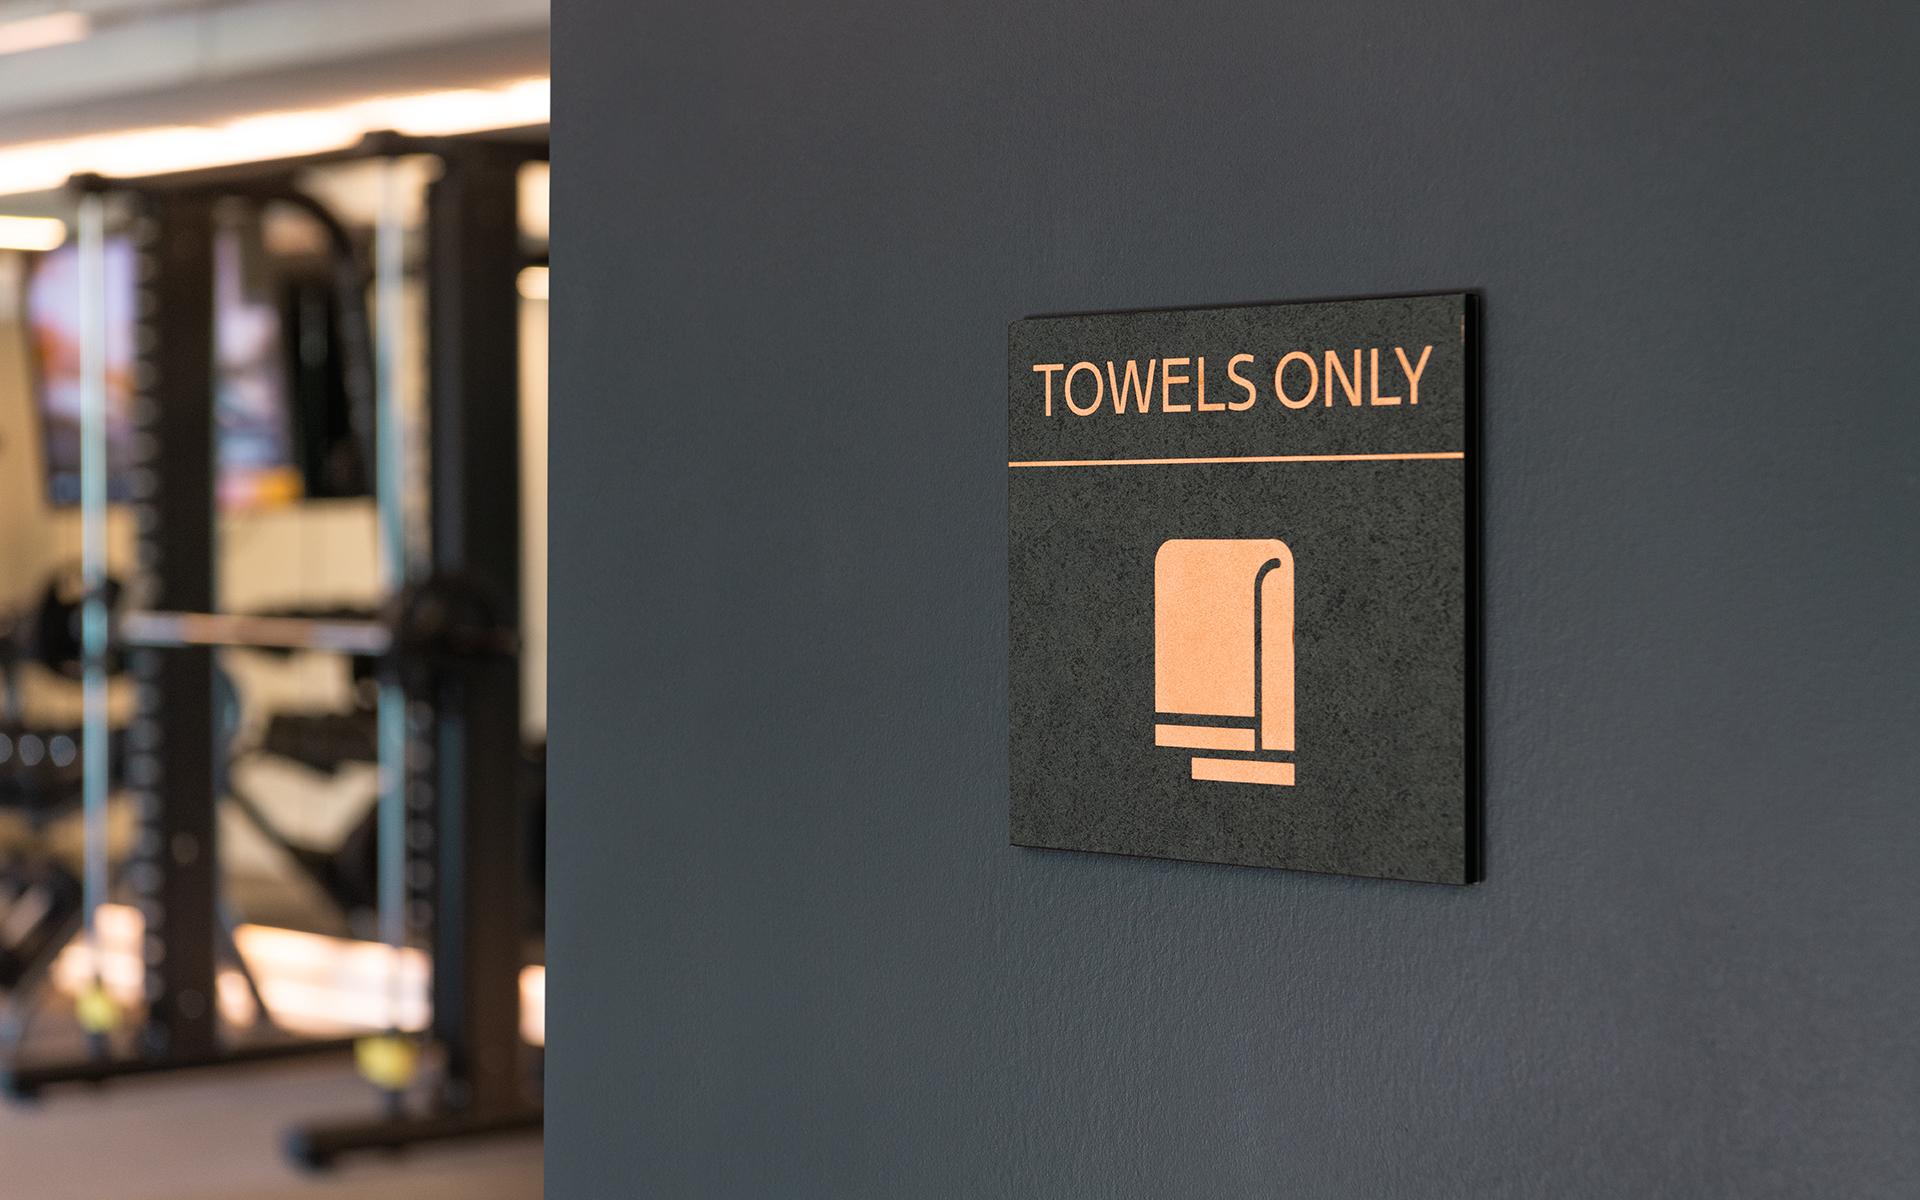 Estate_Towels-Signage_1920x1200